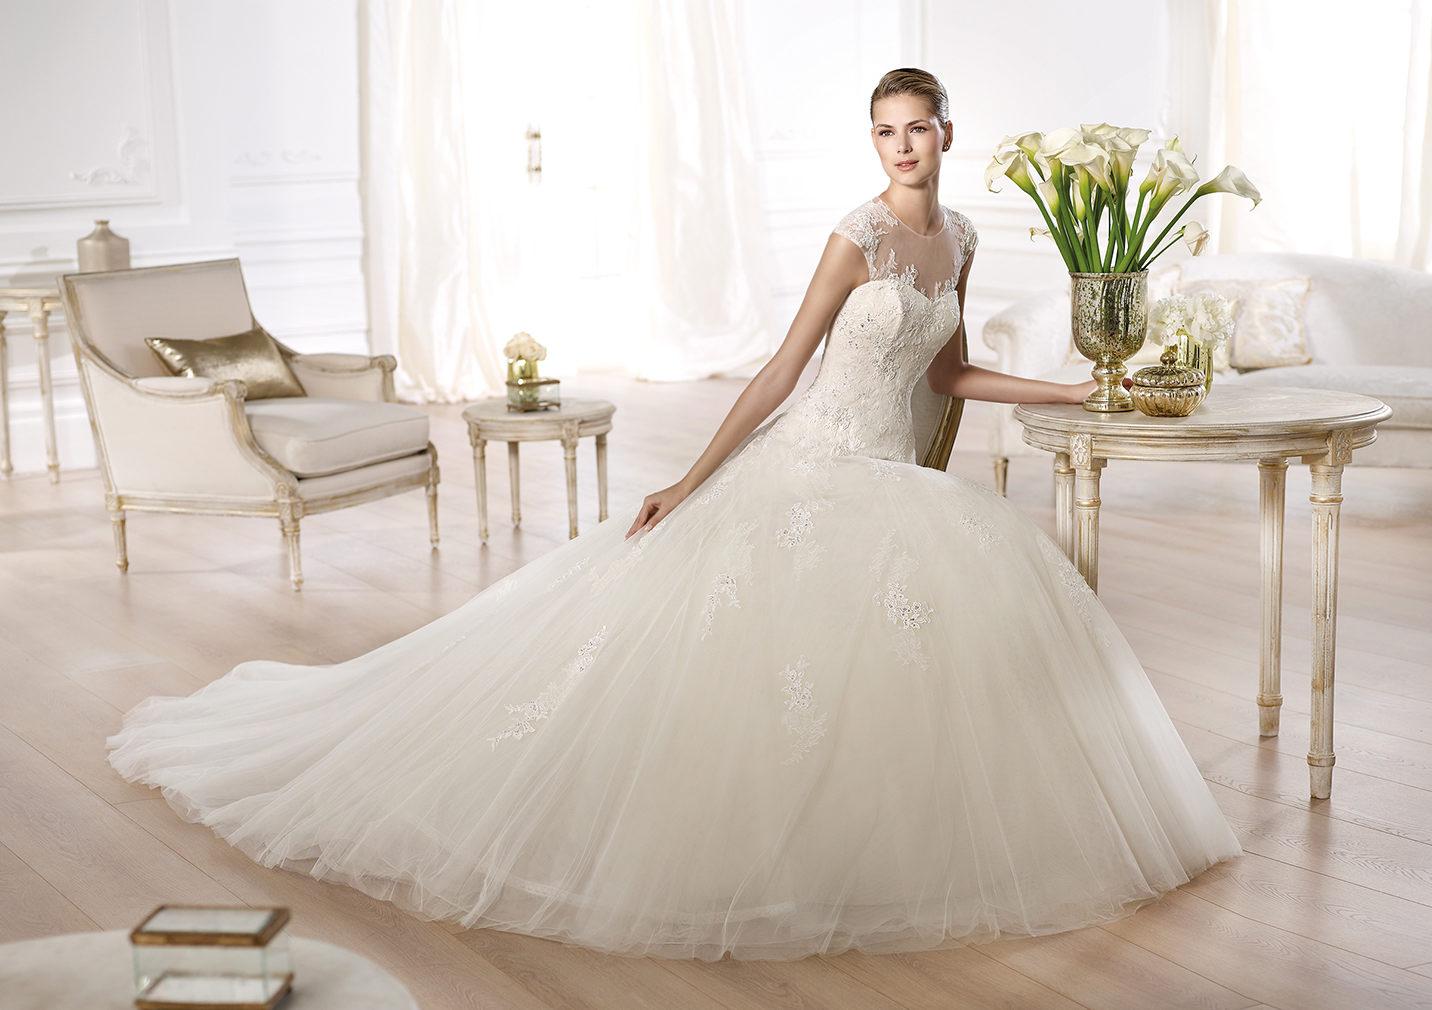 بالصور احدث فساتين الزفاف , موديلات فساتين زفاف جديده لعام 2019 3724 8